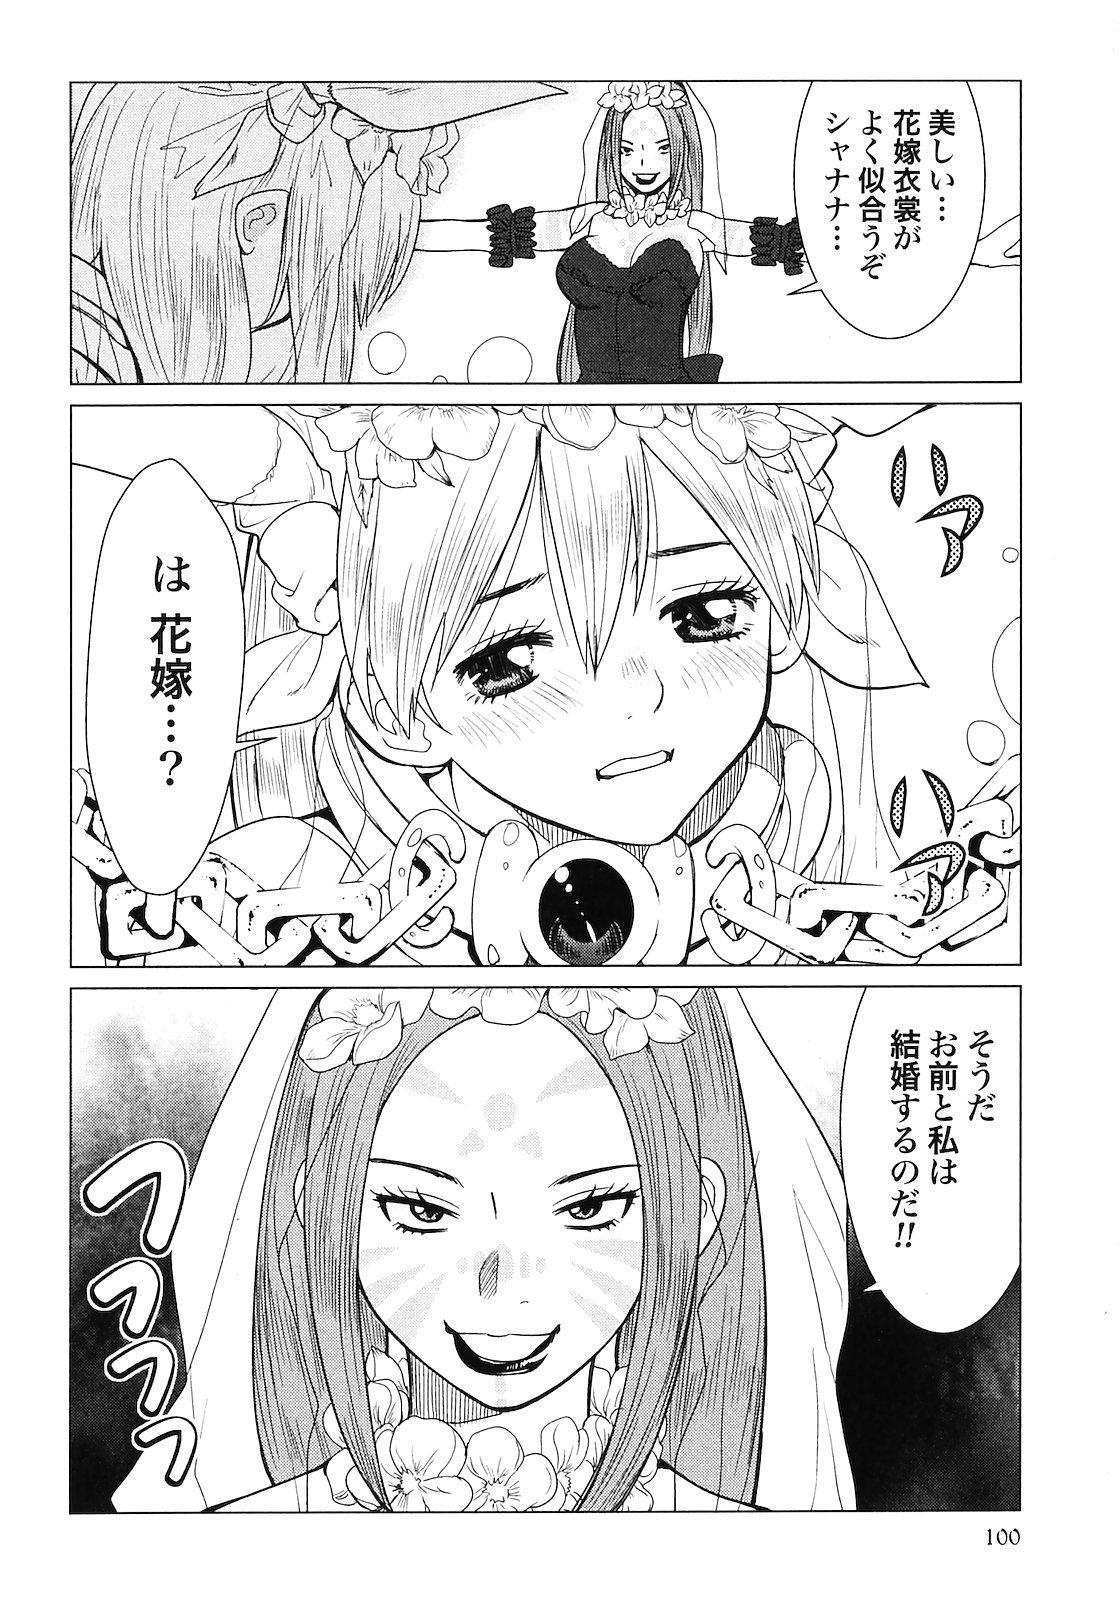 Makyo no Shanana Vol.02 101